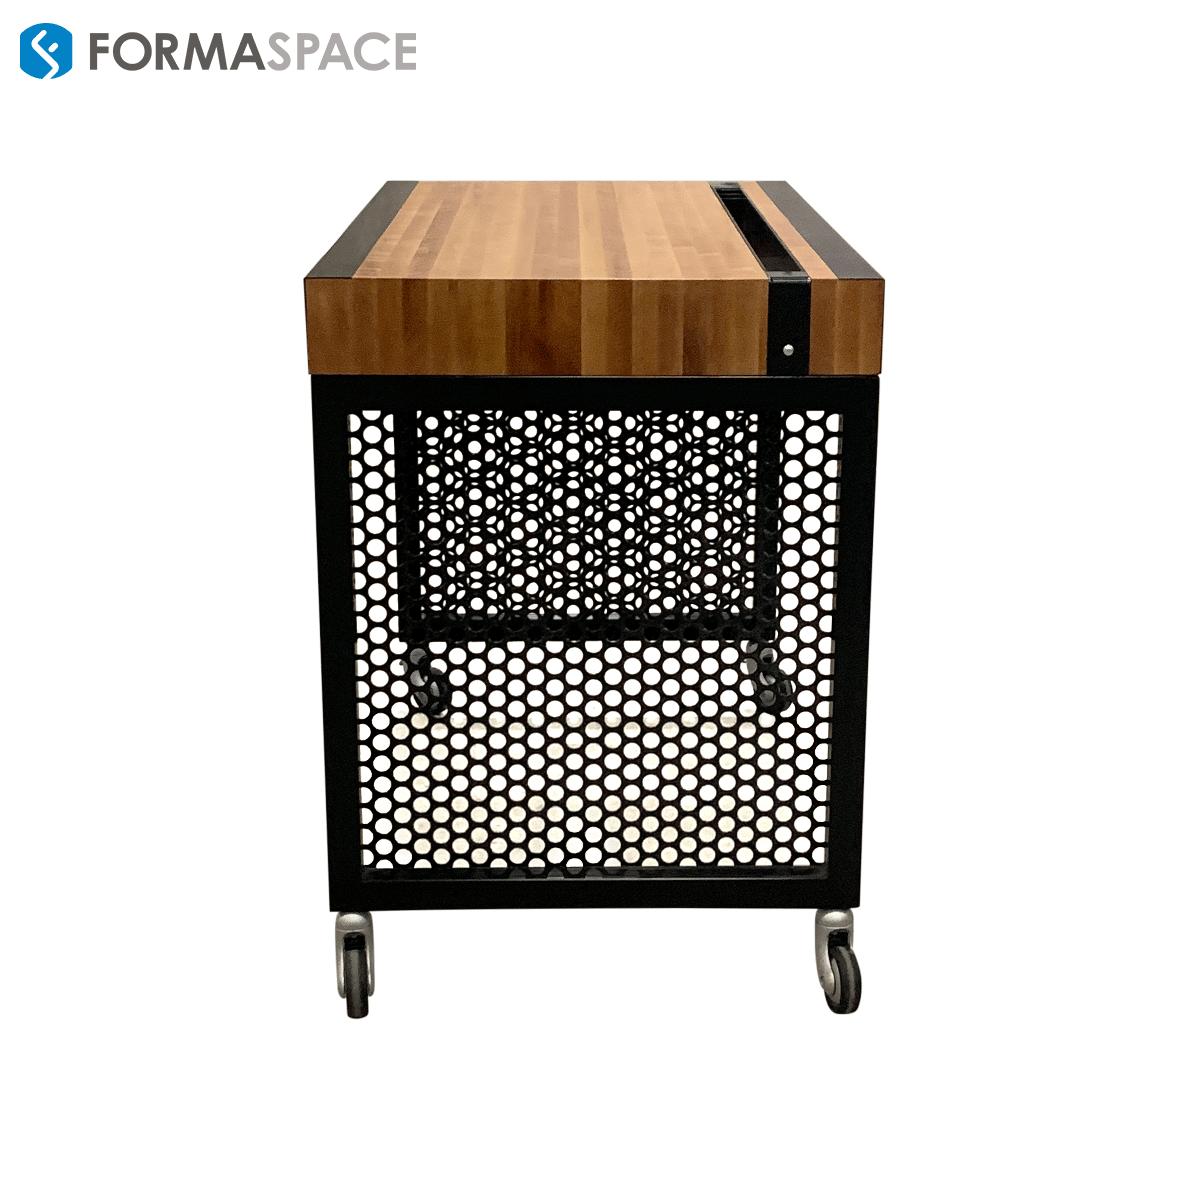 hardwood table with steel honeycomb legs